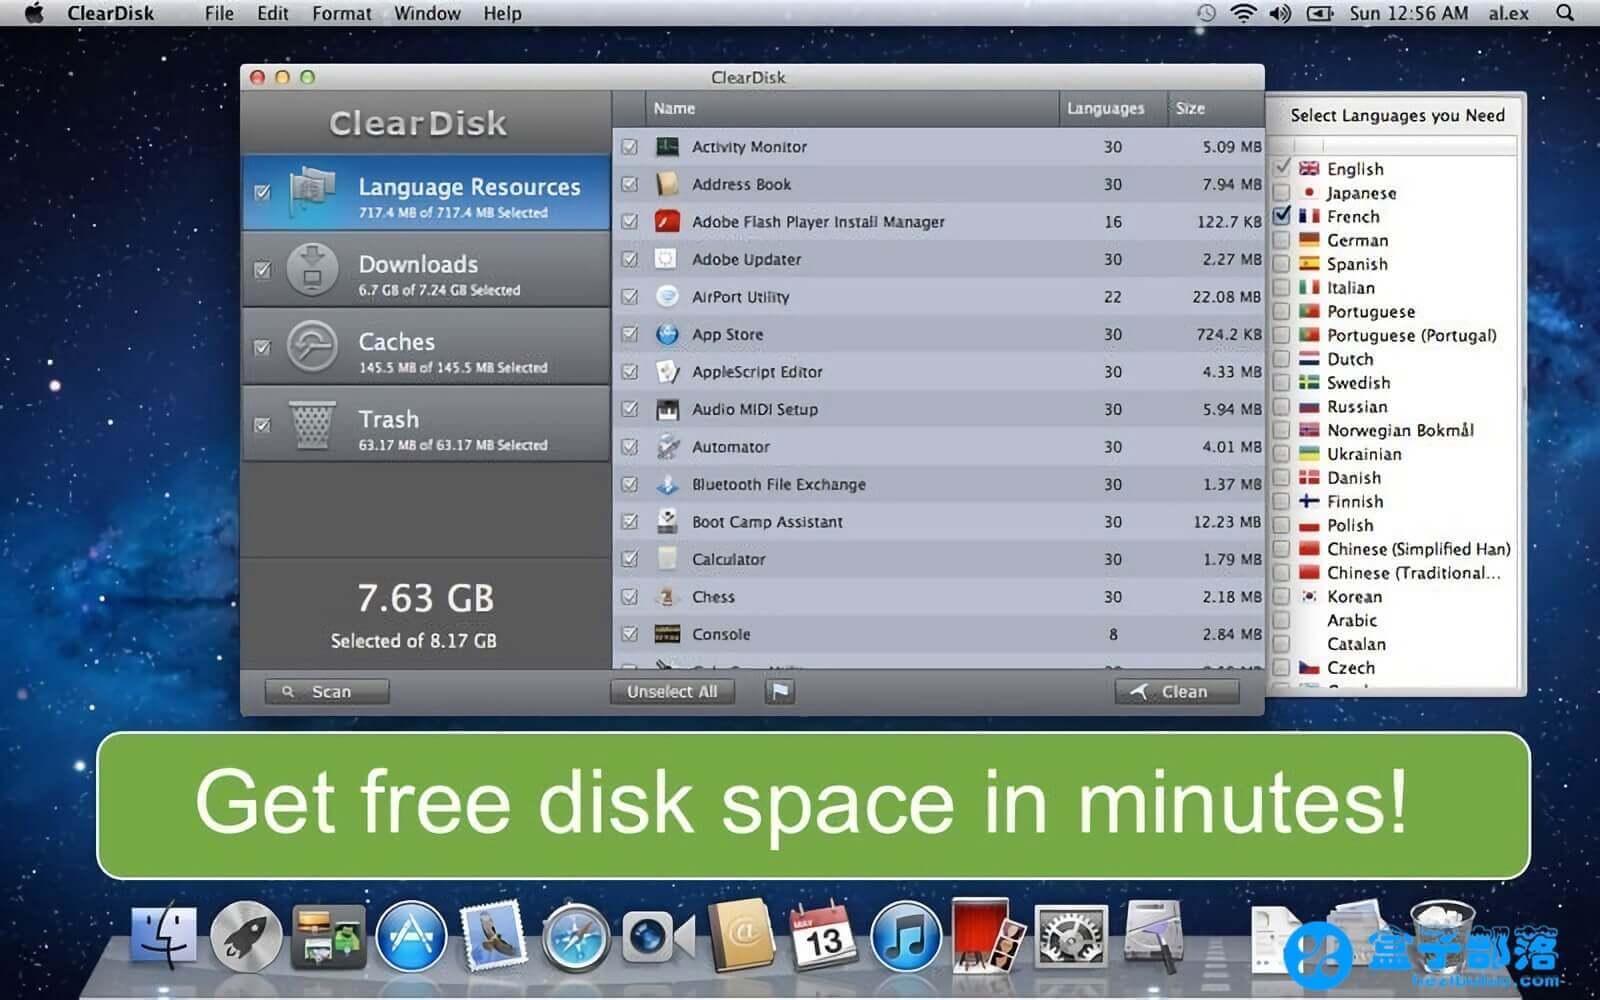 ClearDisk 2.10 一款 macOS 平台的磁盘清理系统优化工具